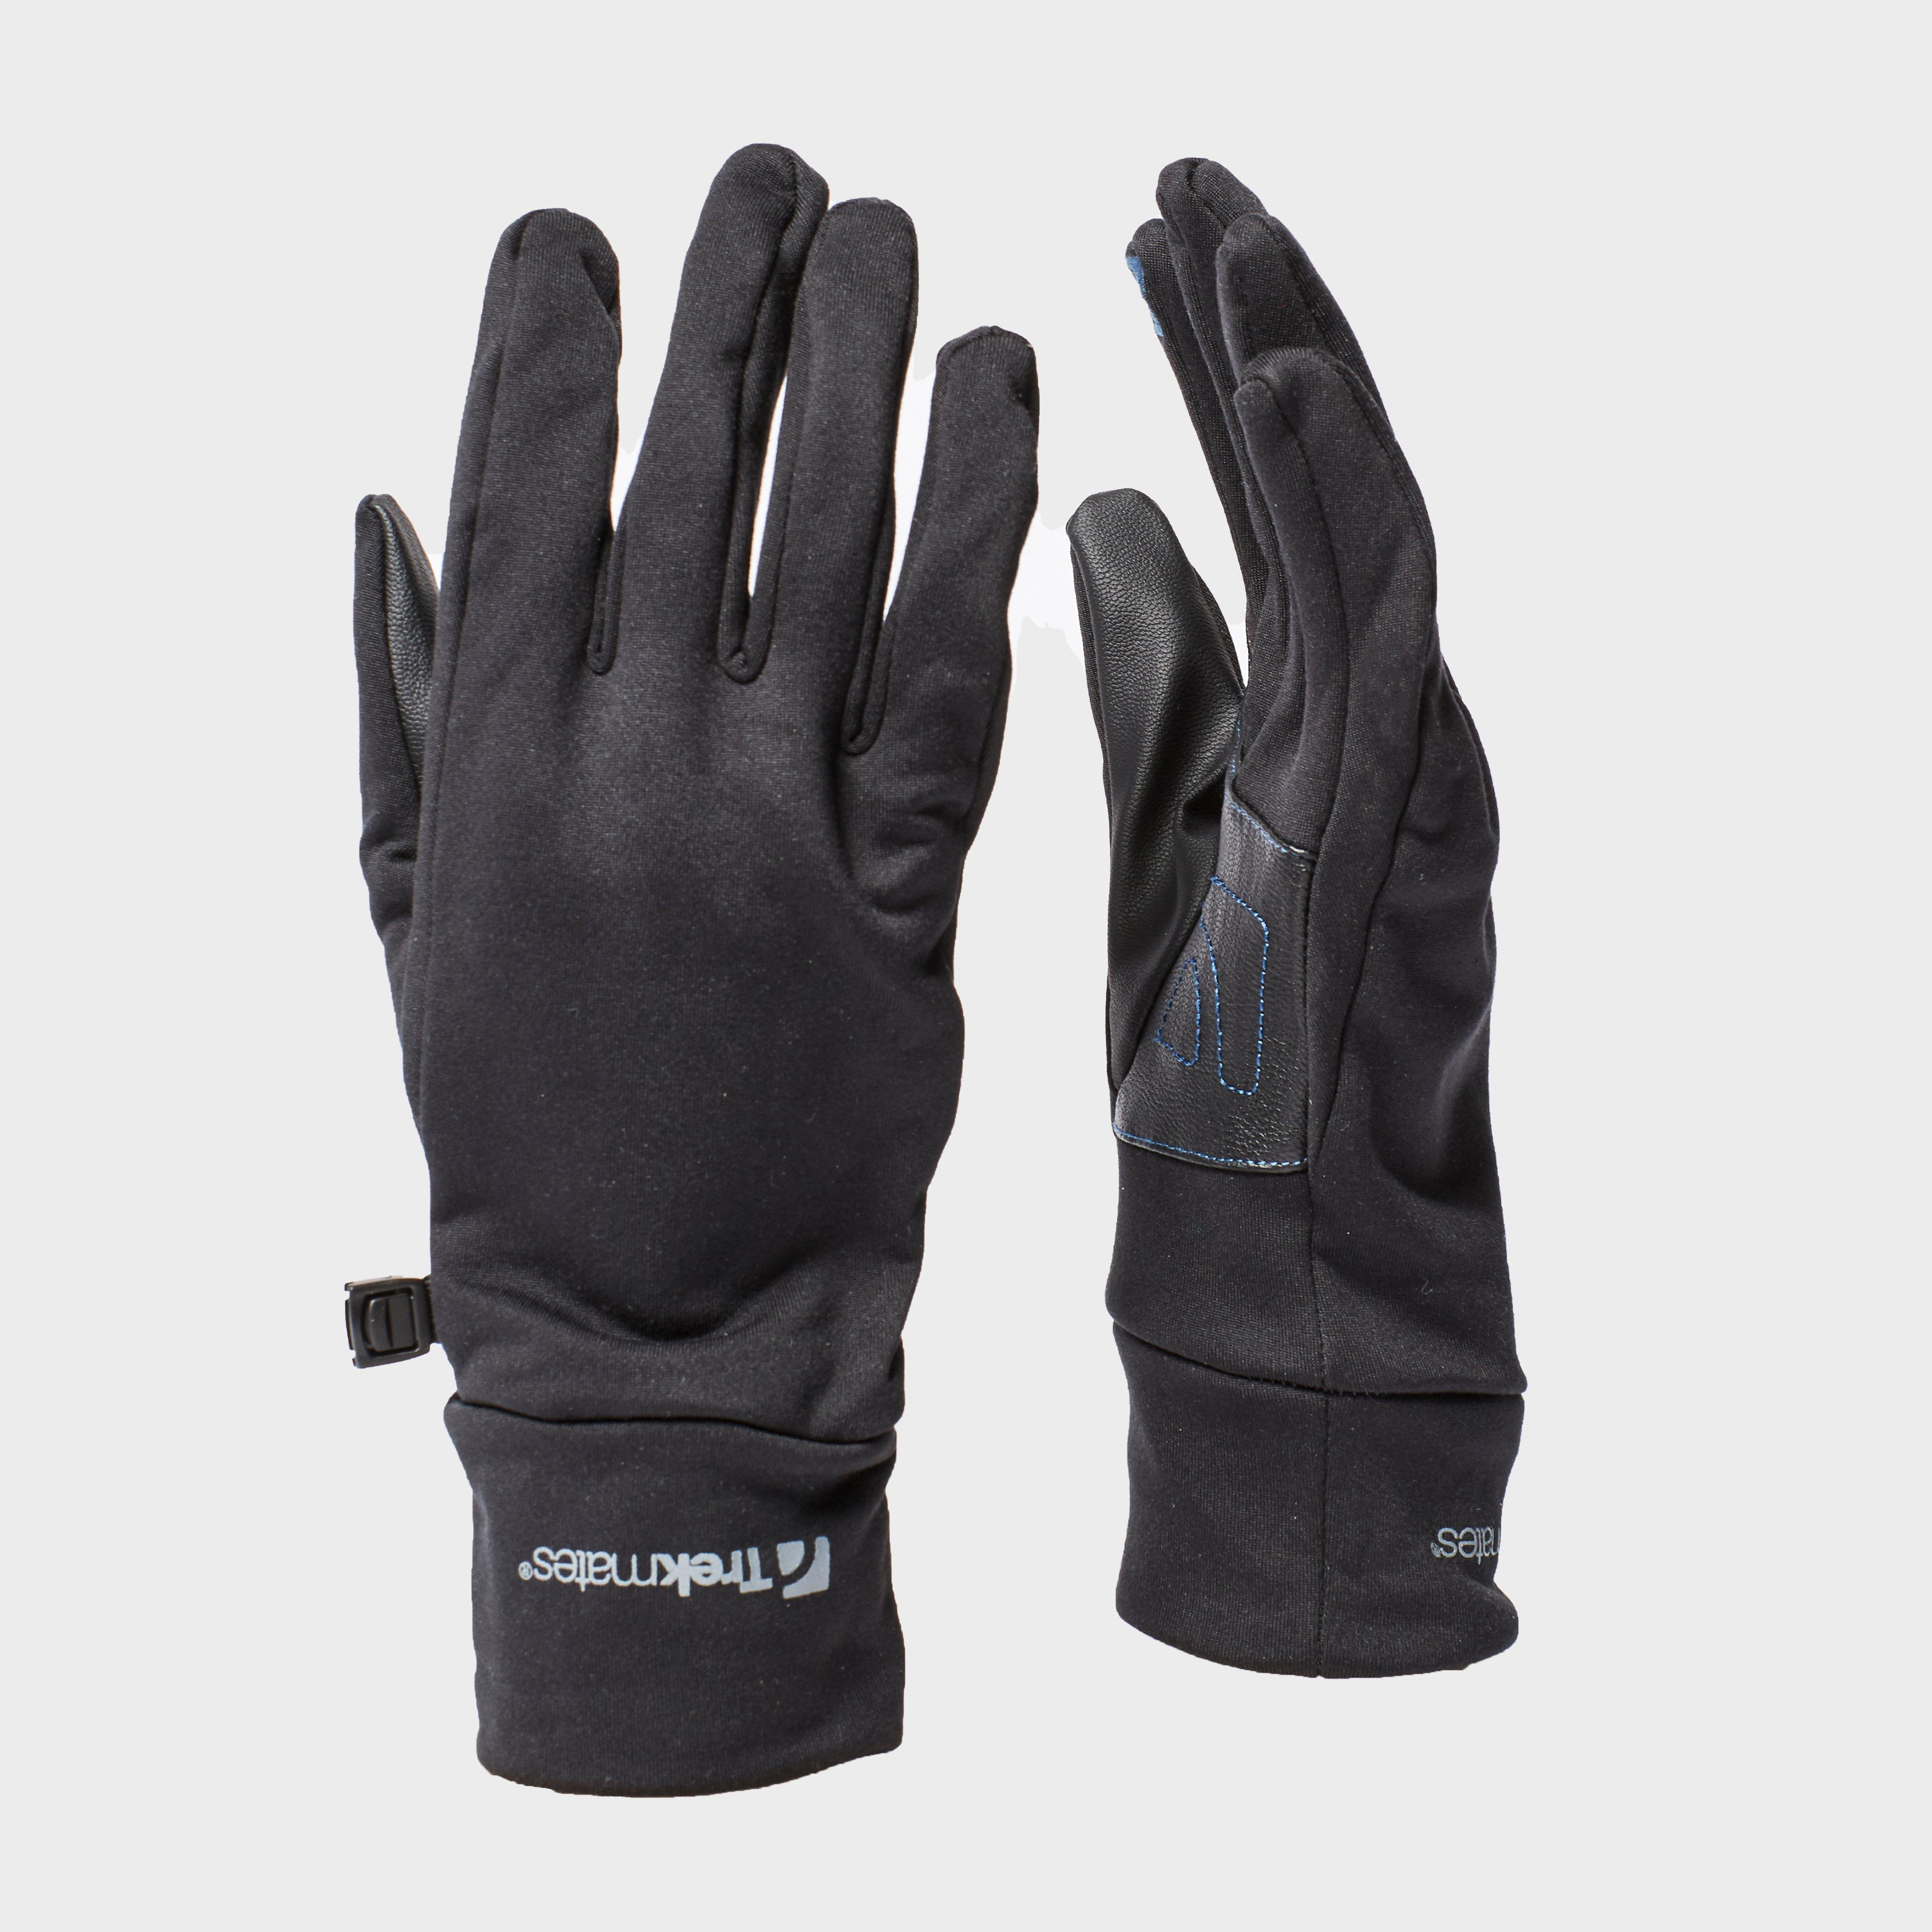 Trekmates Trekmates Mens Ullscarf Gloves - Black, Black